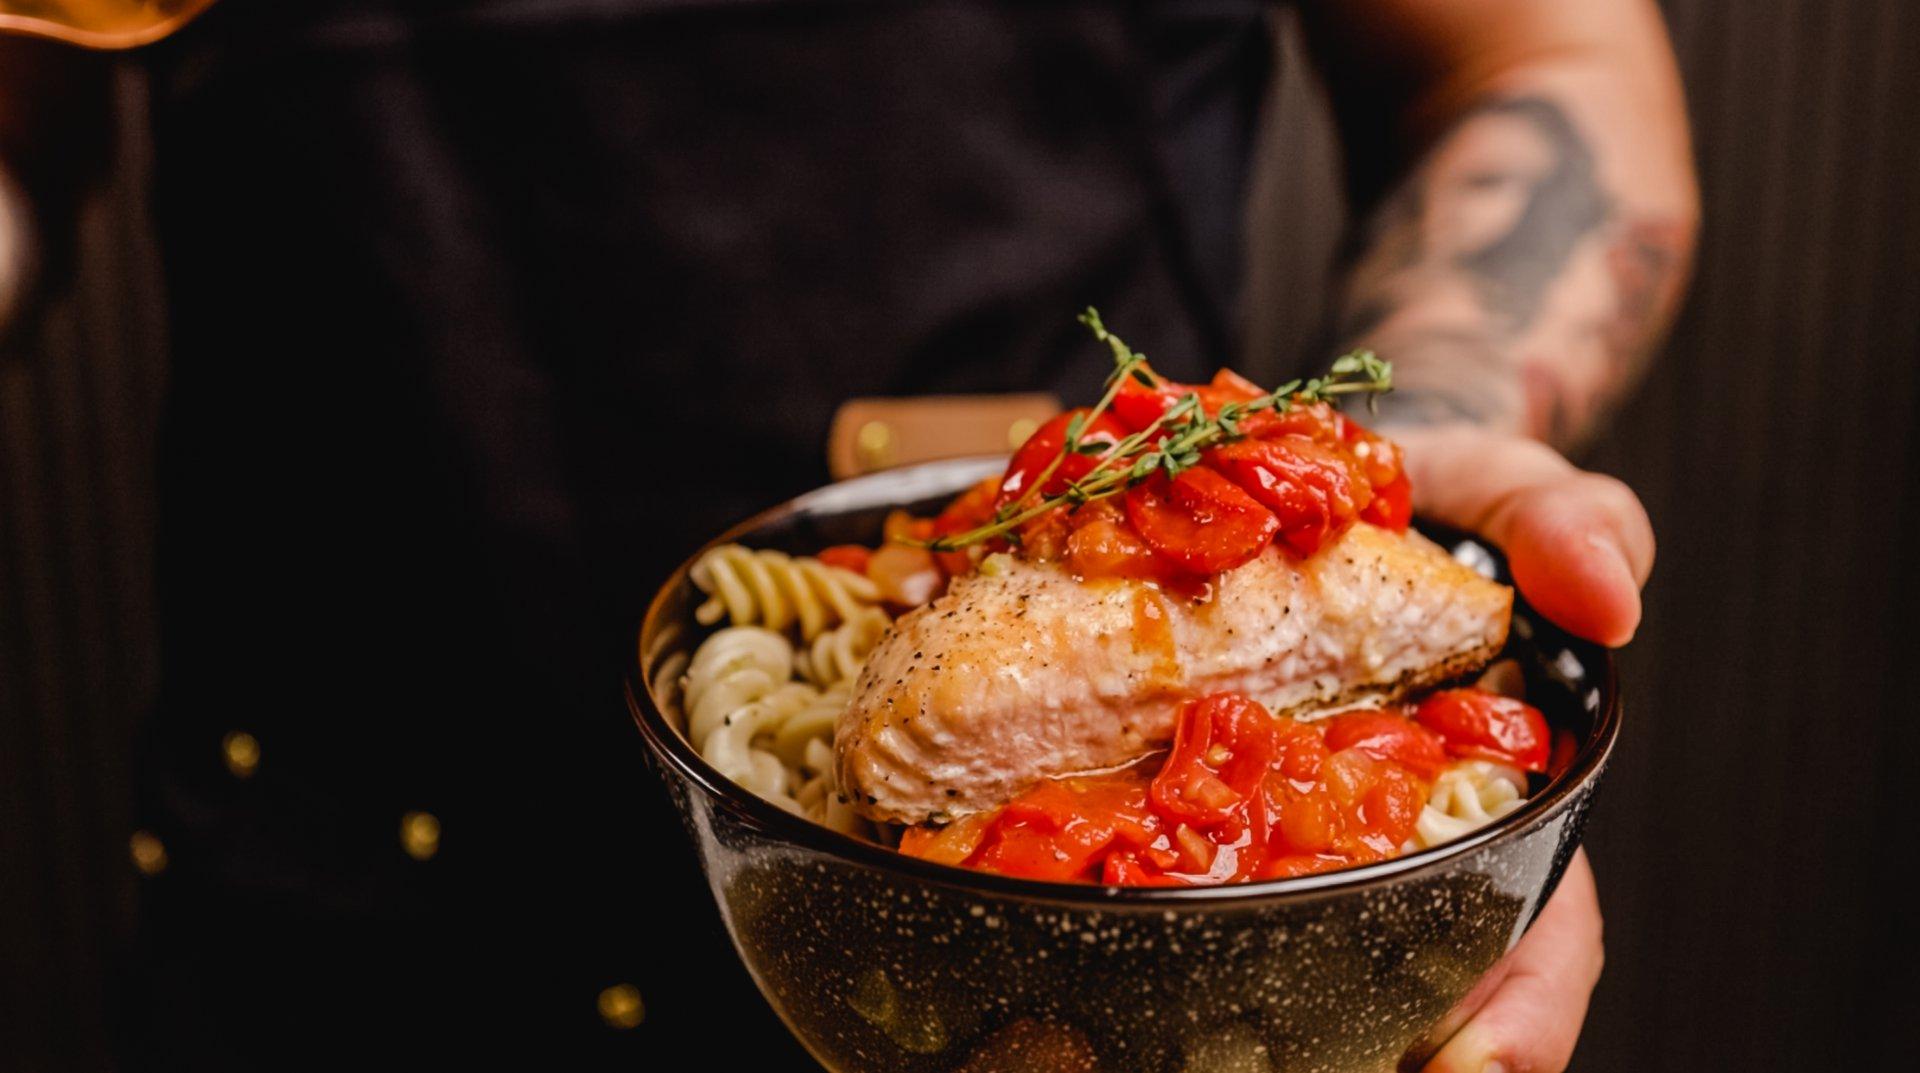 Grilled Salmon with Pasta Pomodoro